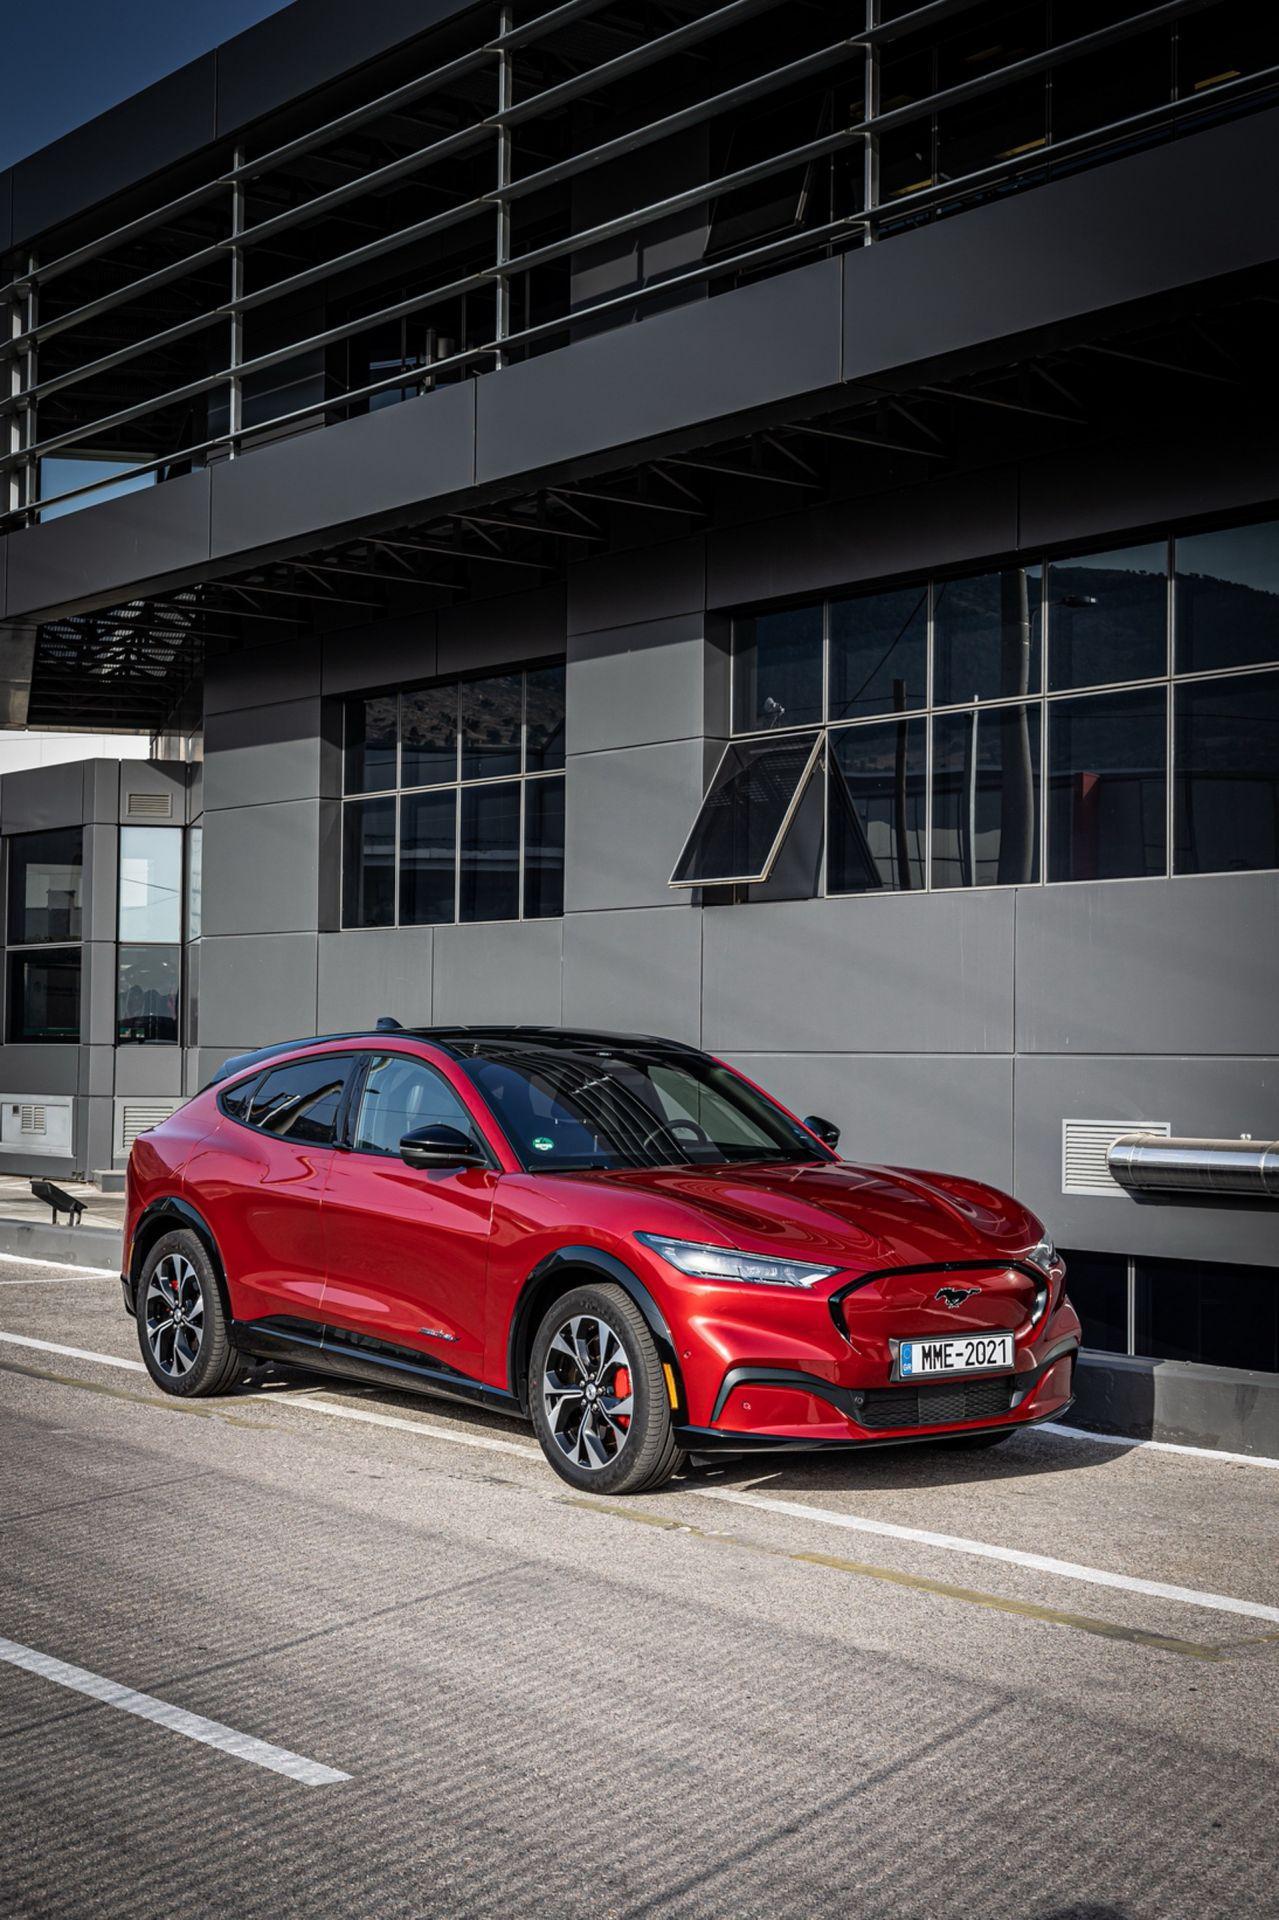 Ford_Mustang_Mach-E_greek_presskit-0058